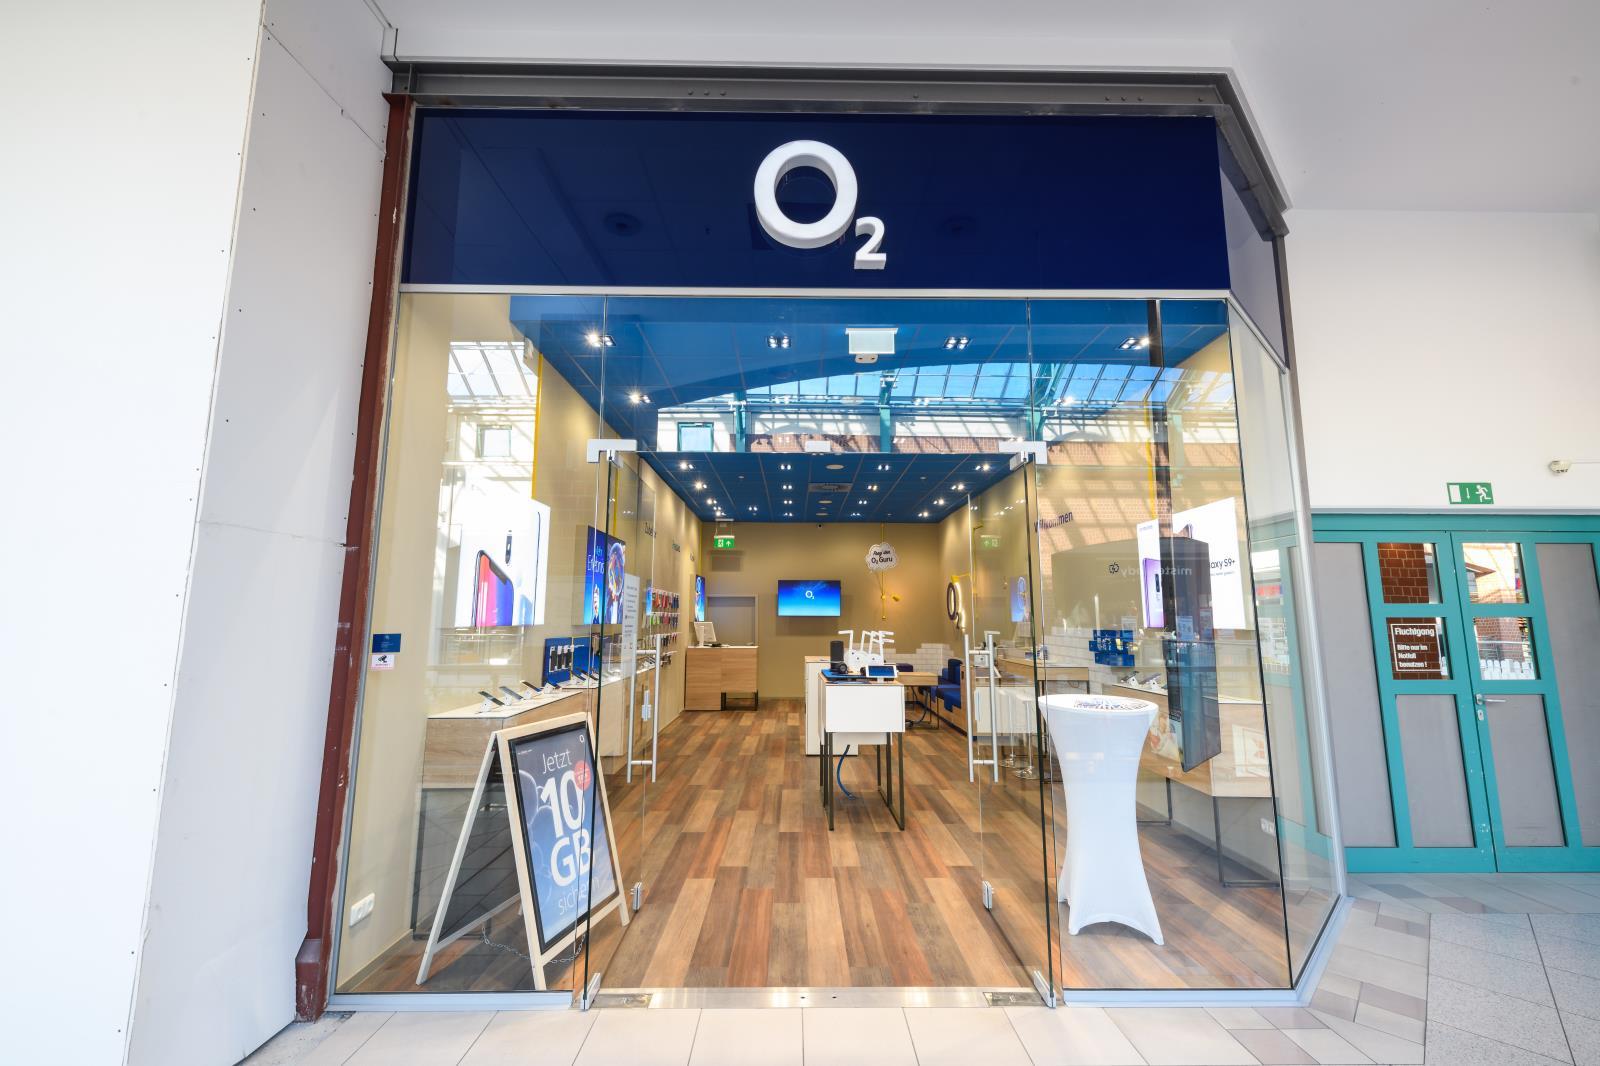 o2 Shop, Thomas-Mann-Platz 1 in Chemnitz